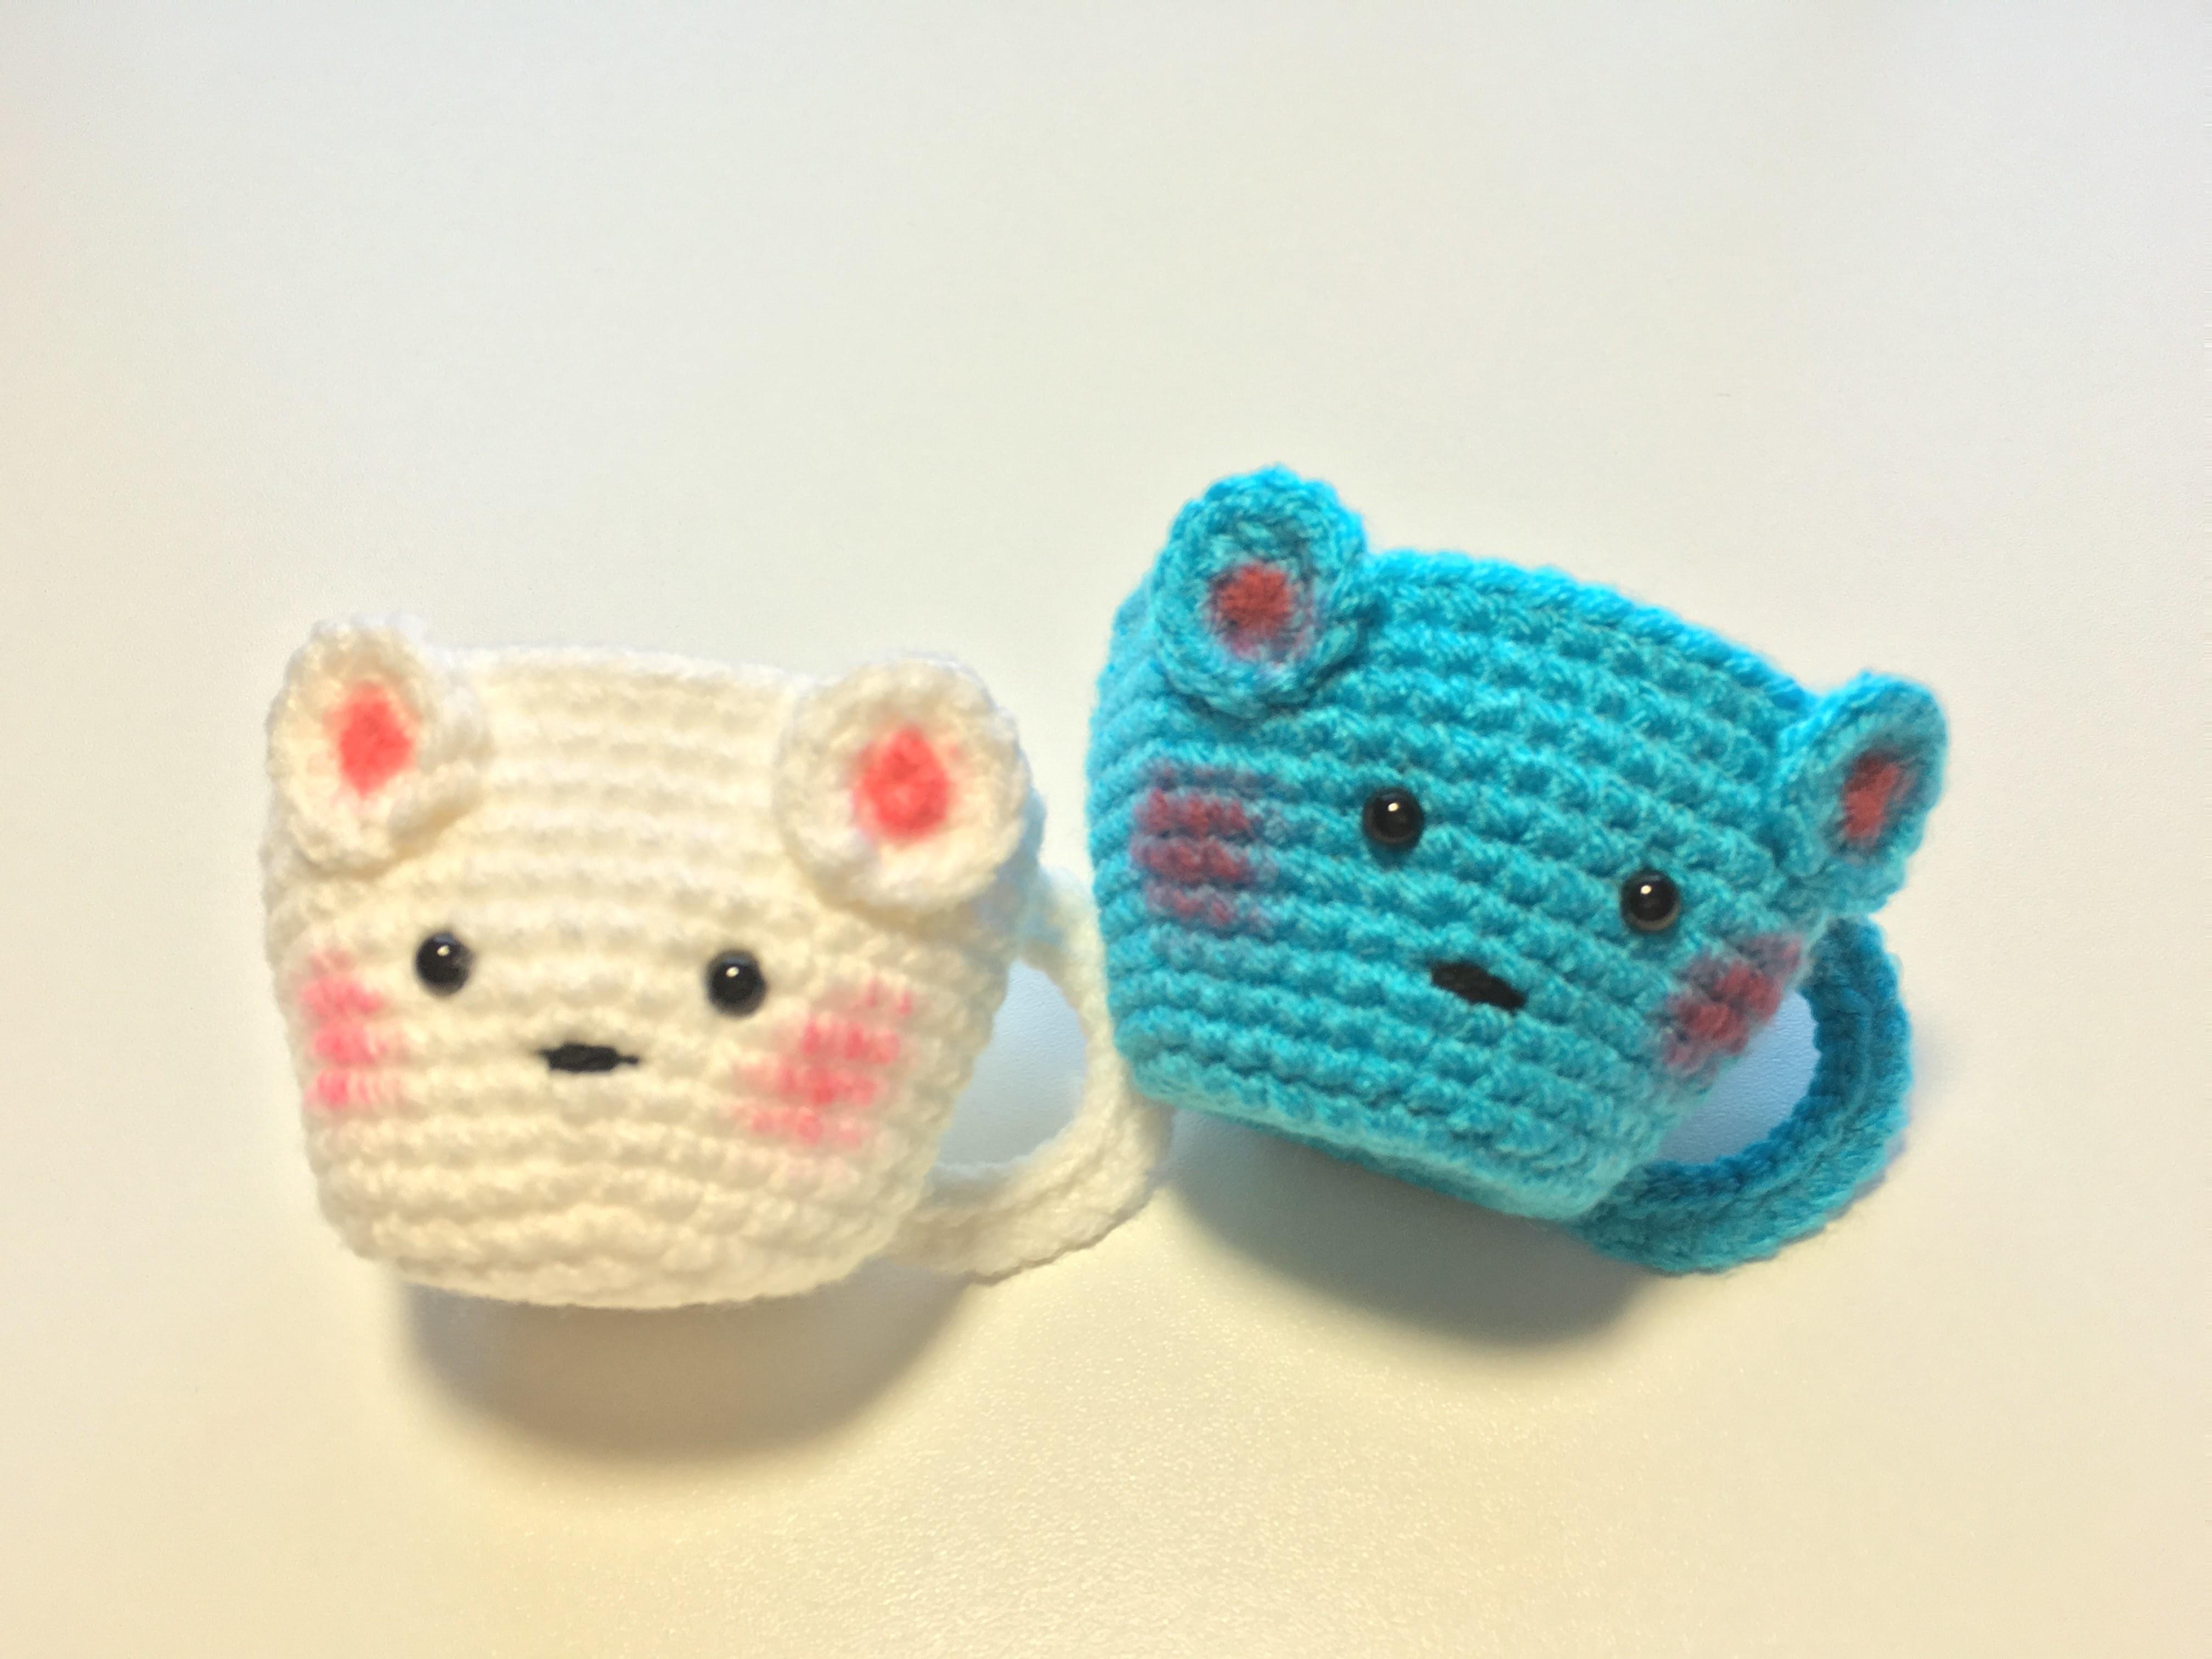 Como hacer una taza a crochet. how to crochet a tea cup